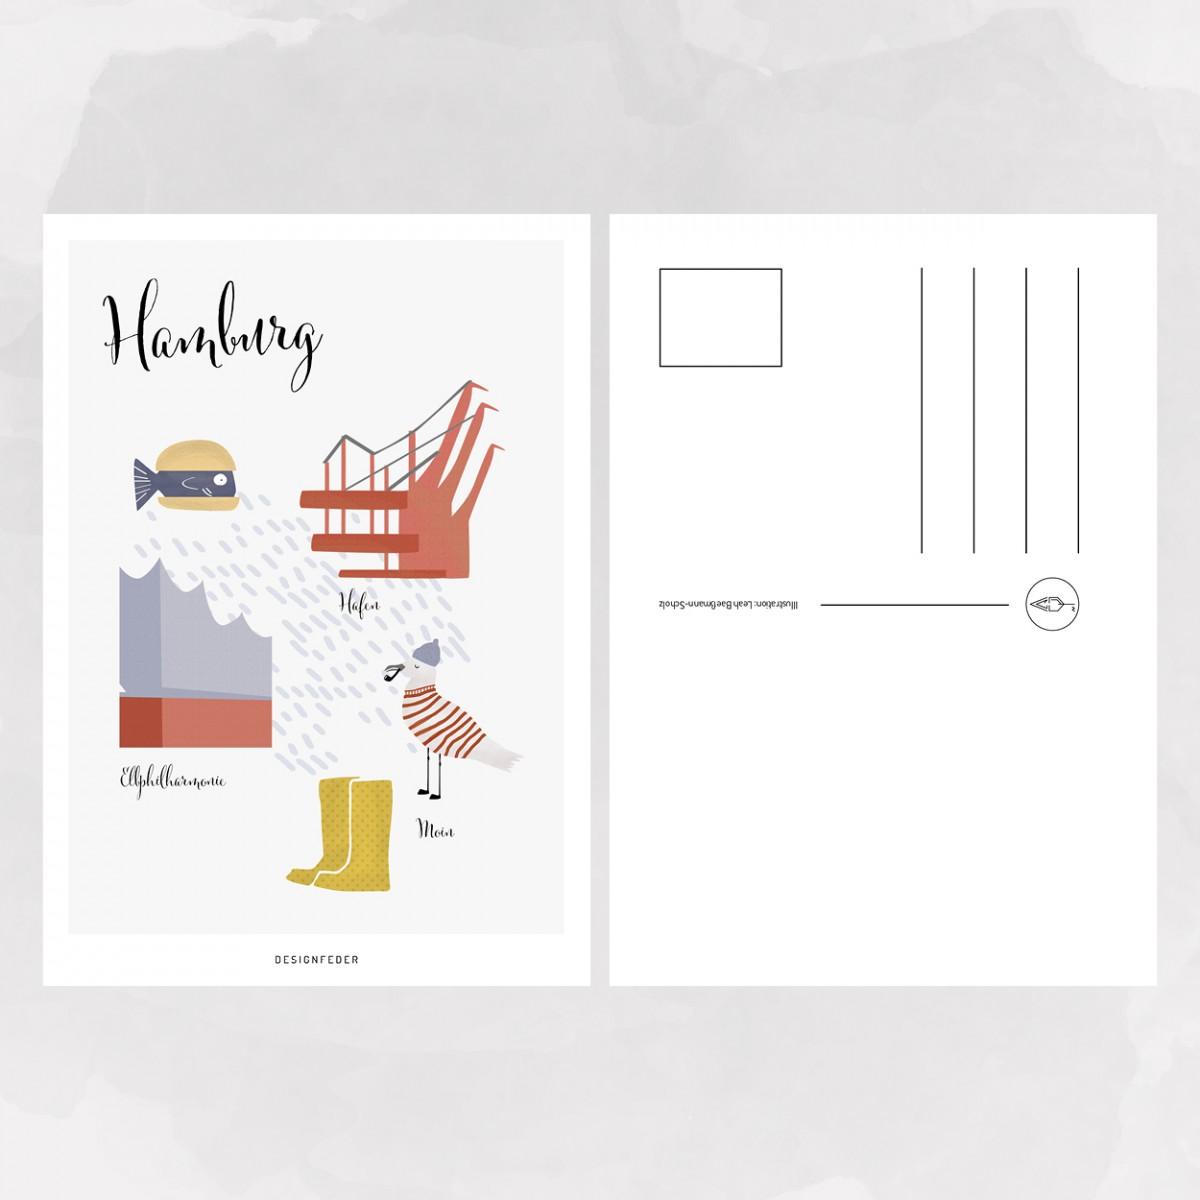 designfeder | Postkarte Hamburg